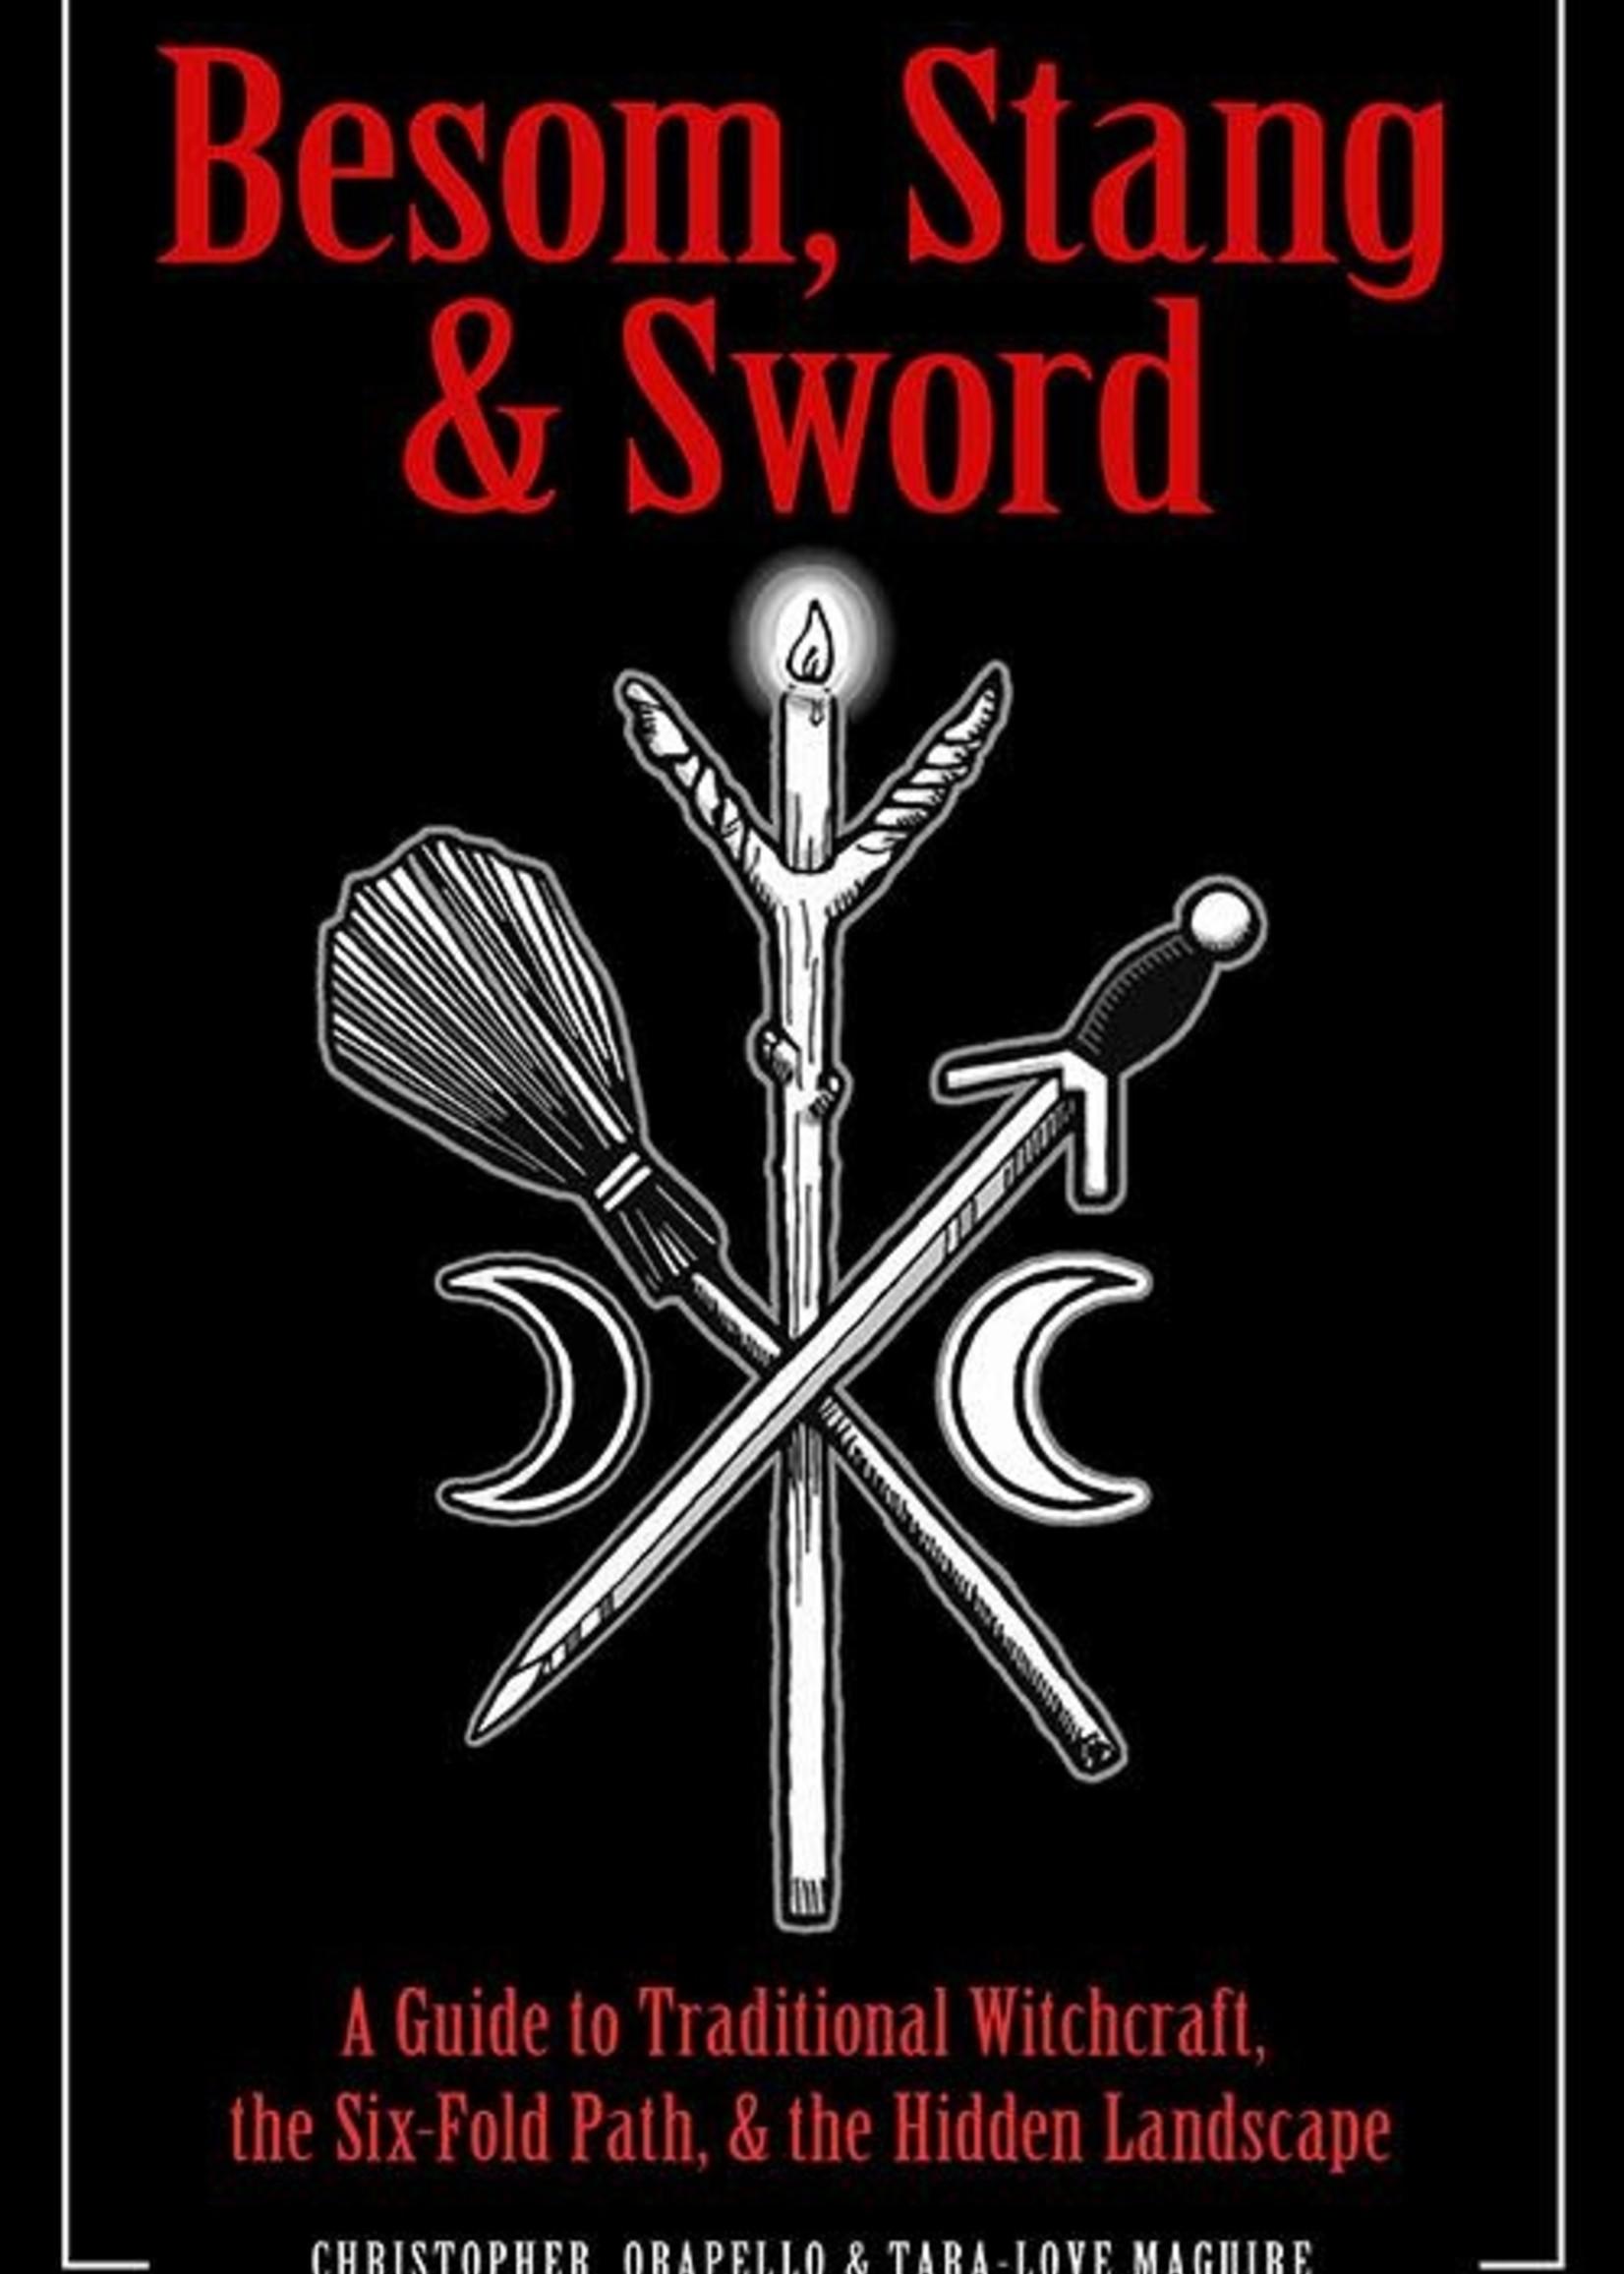 Besom, Stang & Sword (Orapello/MacGuire)